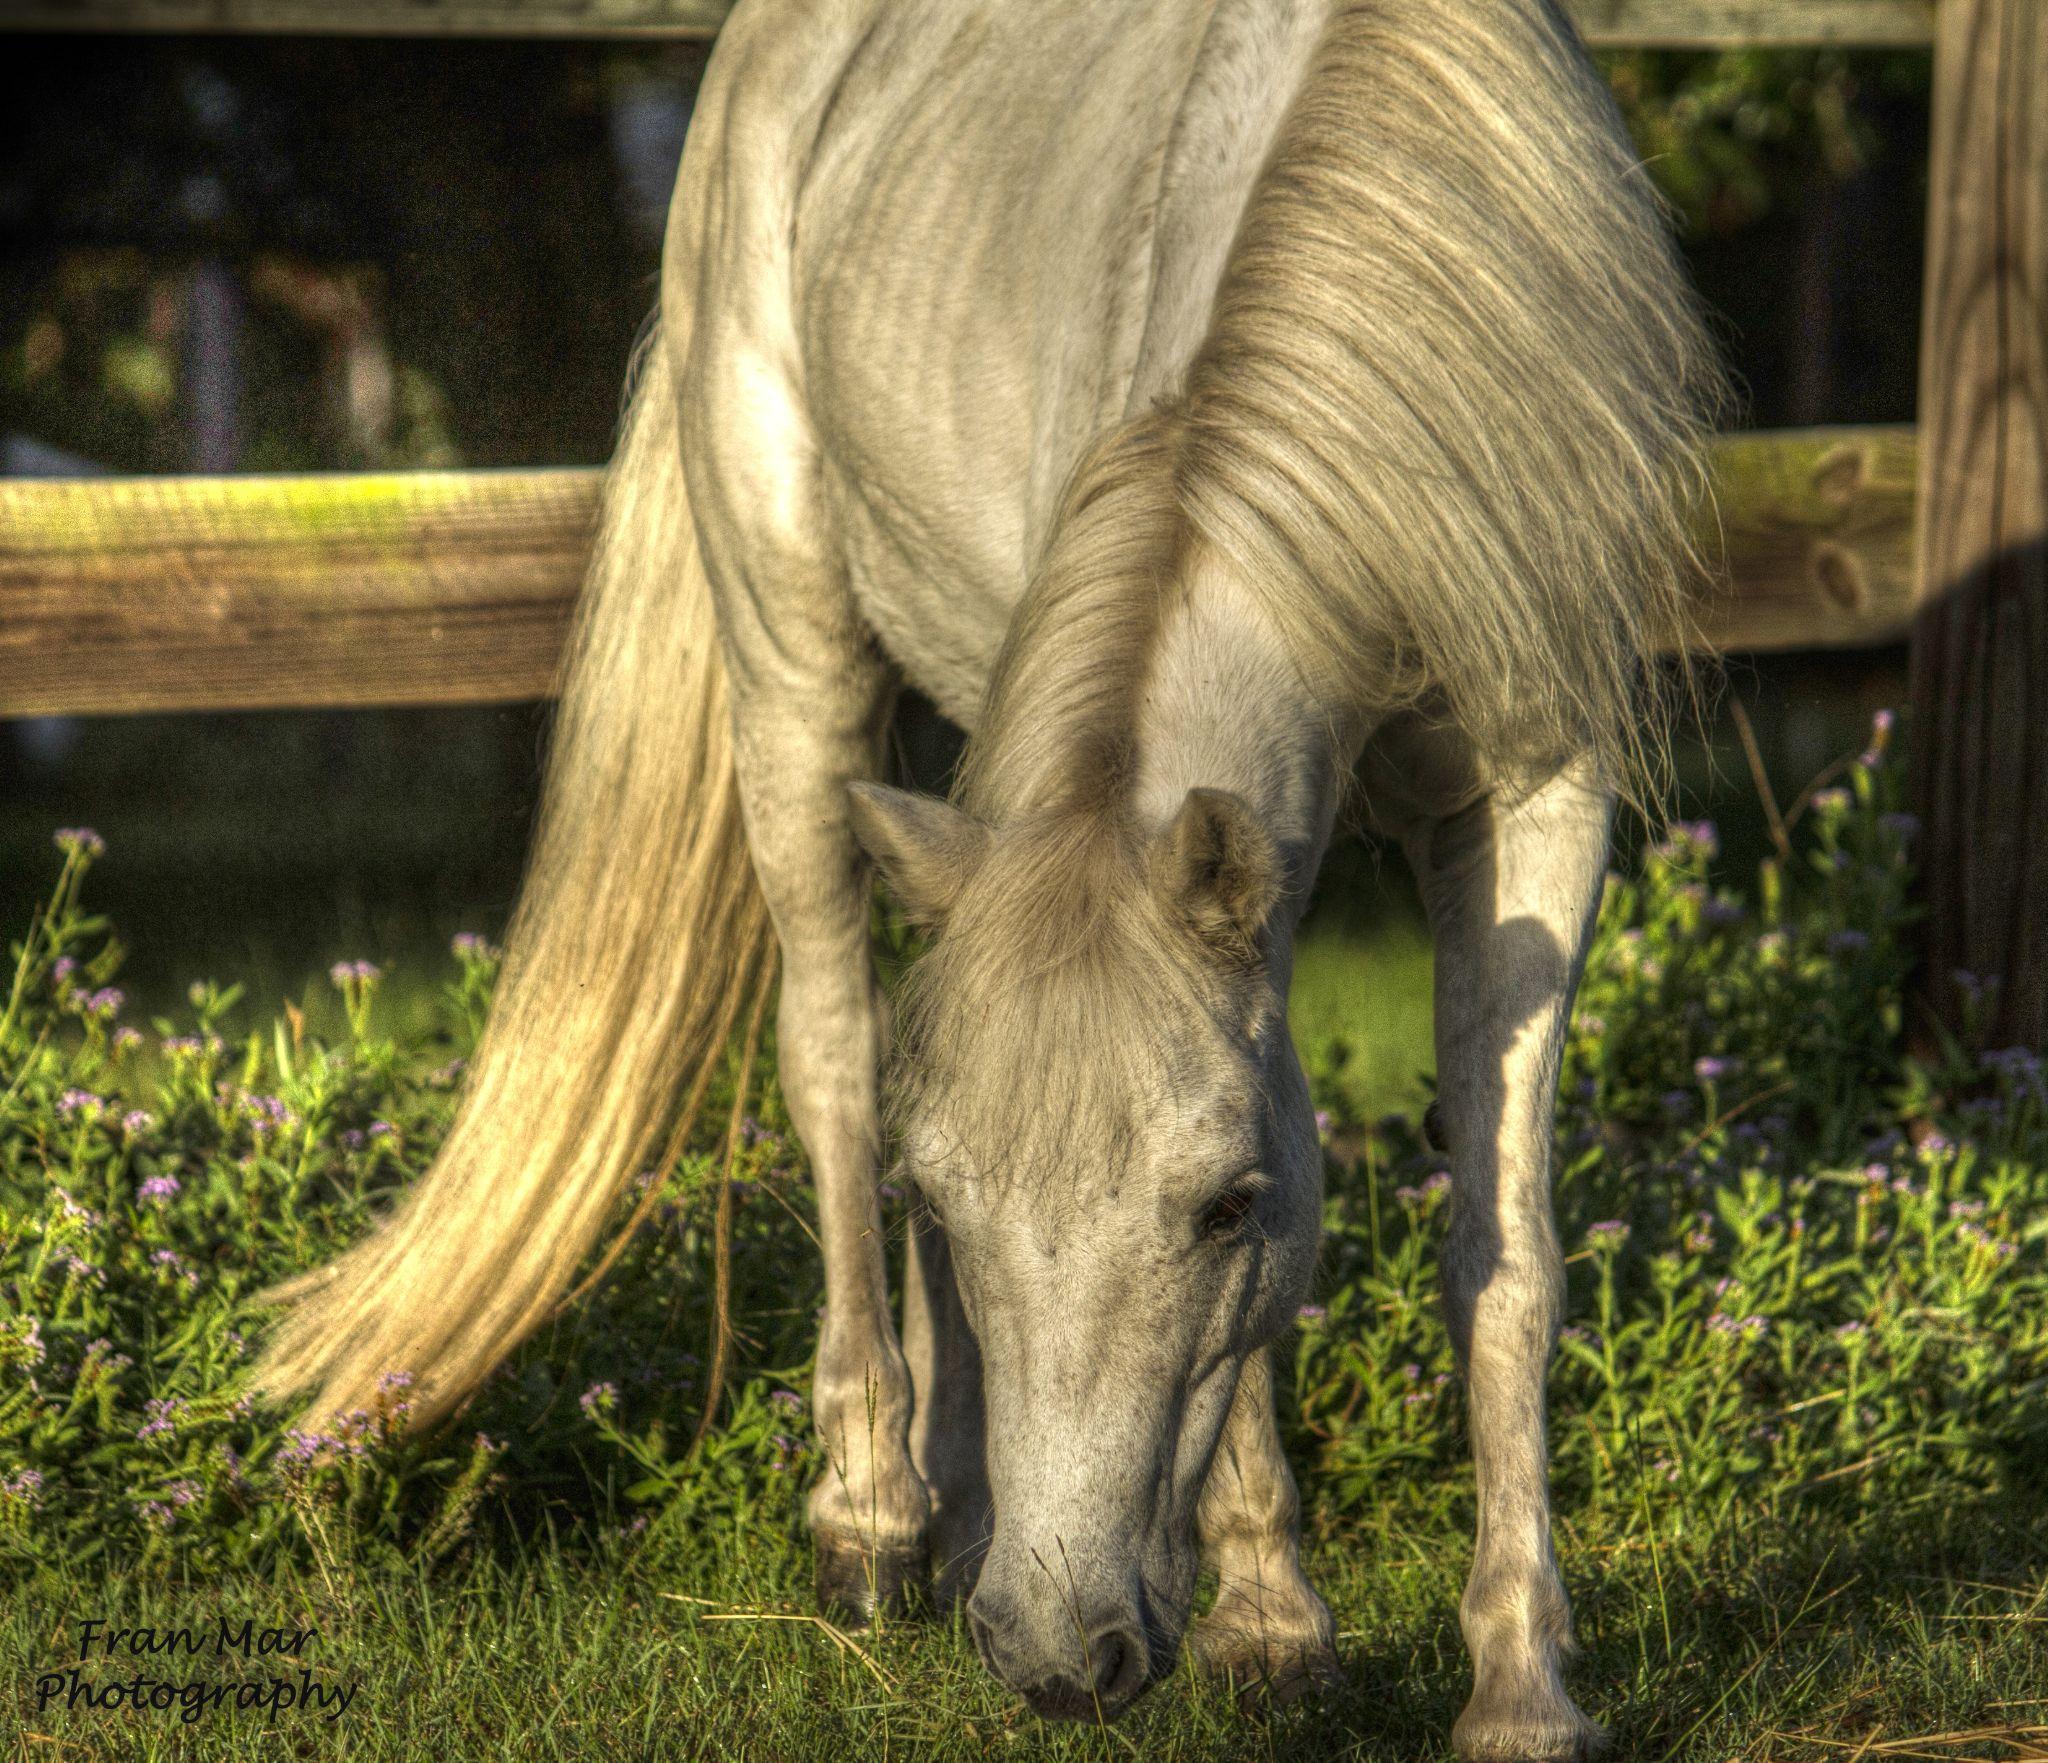 Little pony by Meg Francoeur